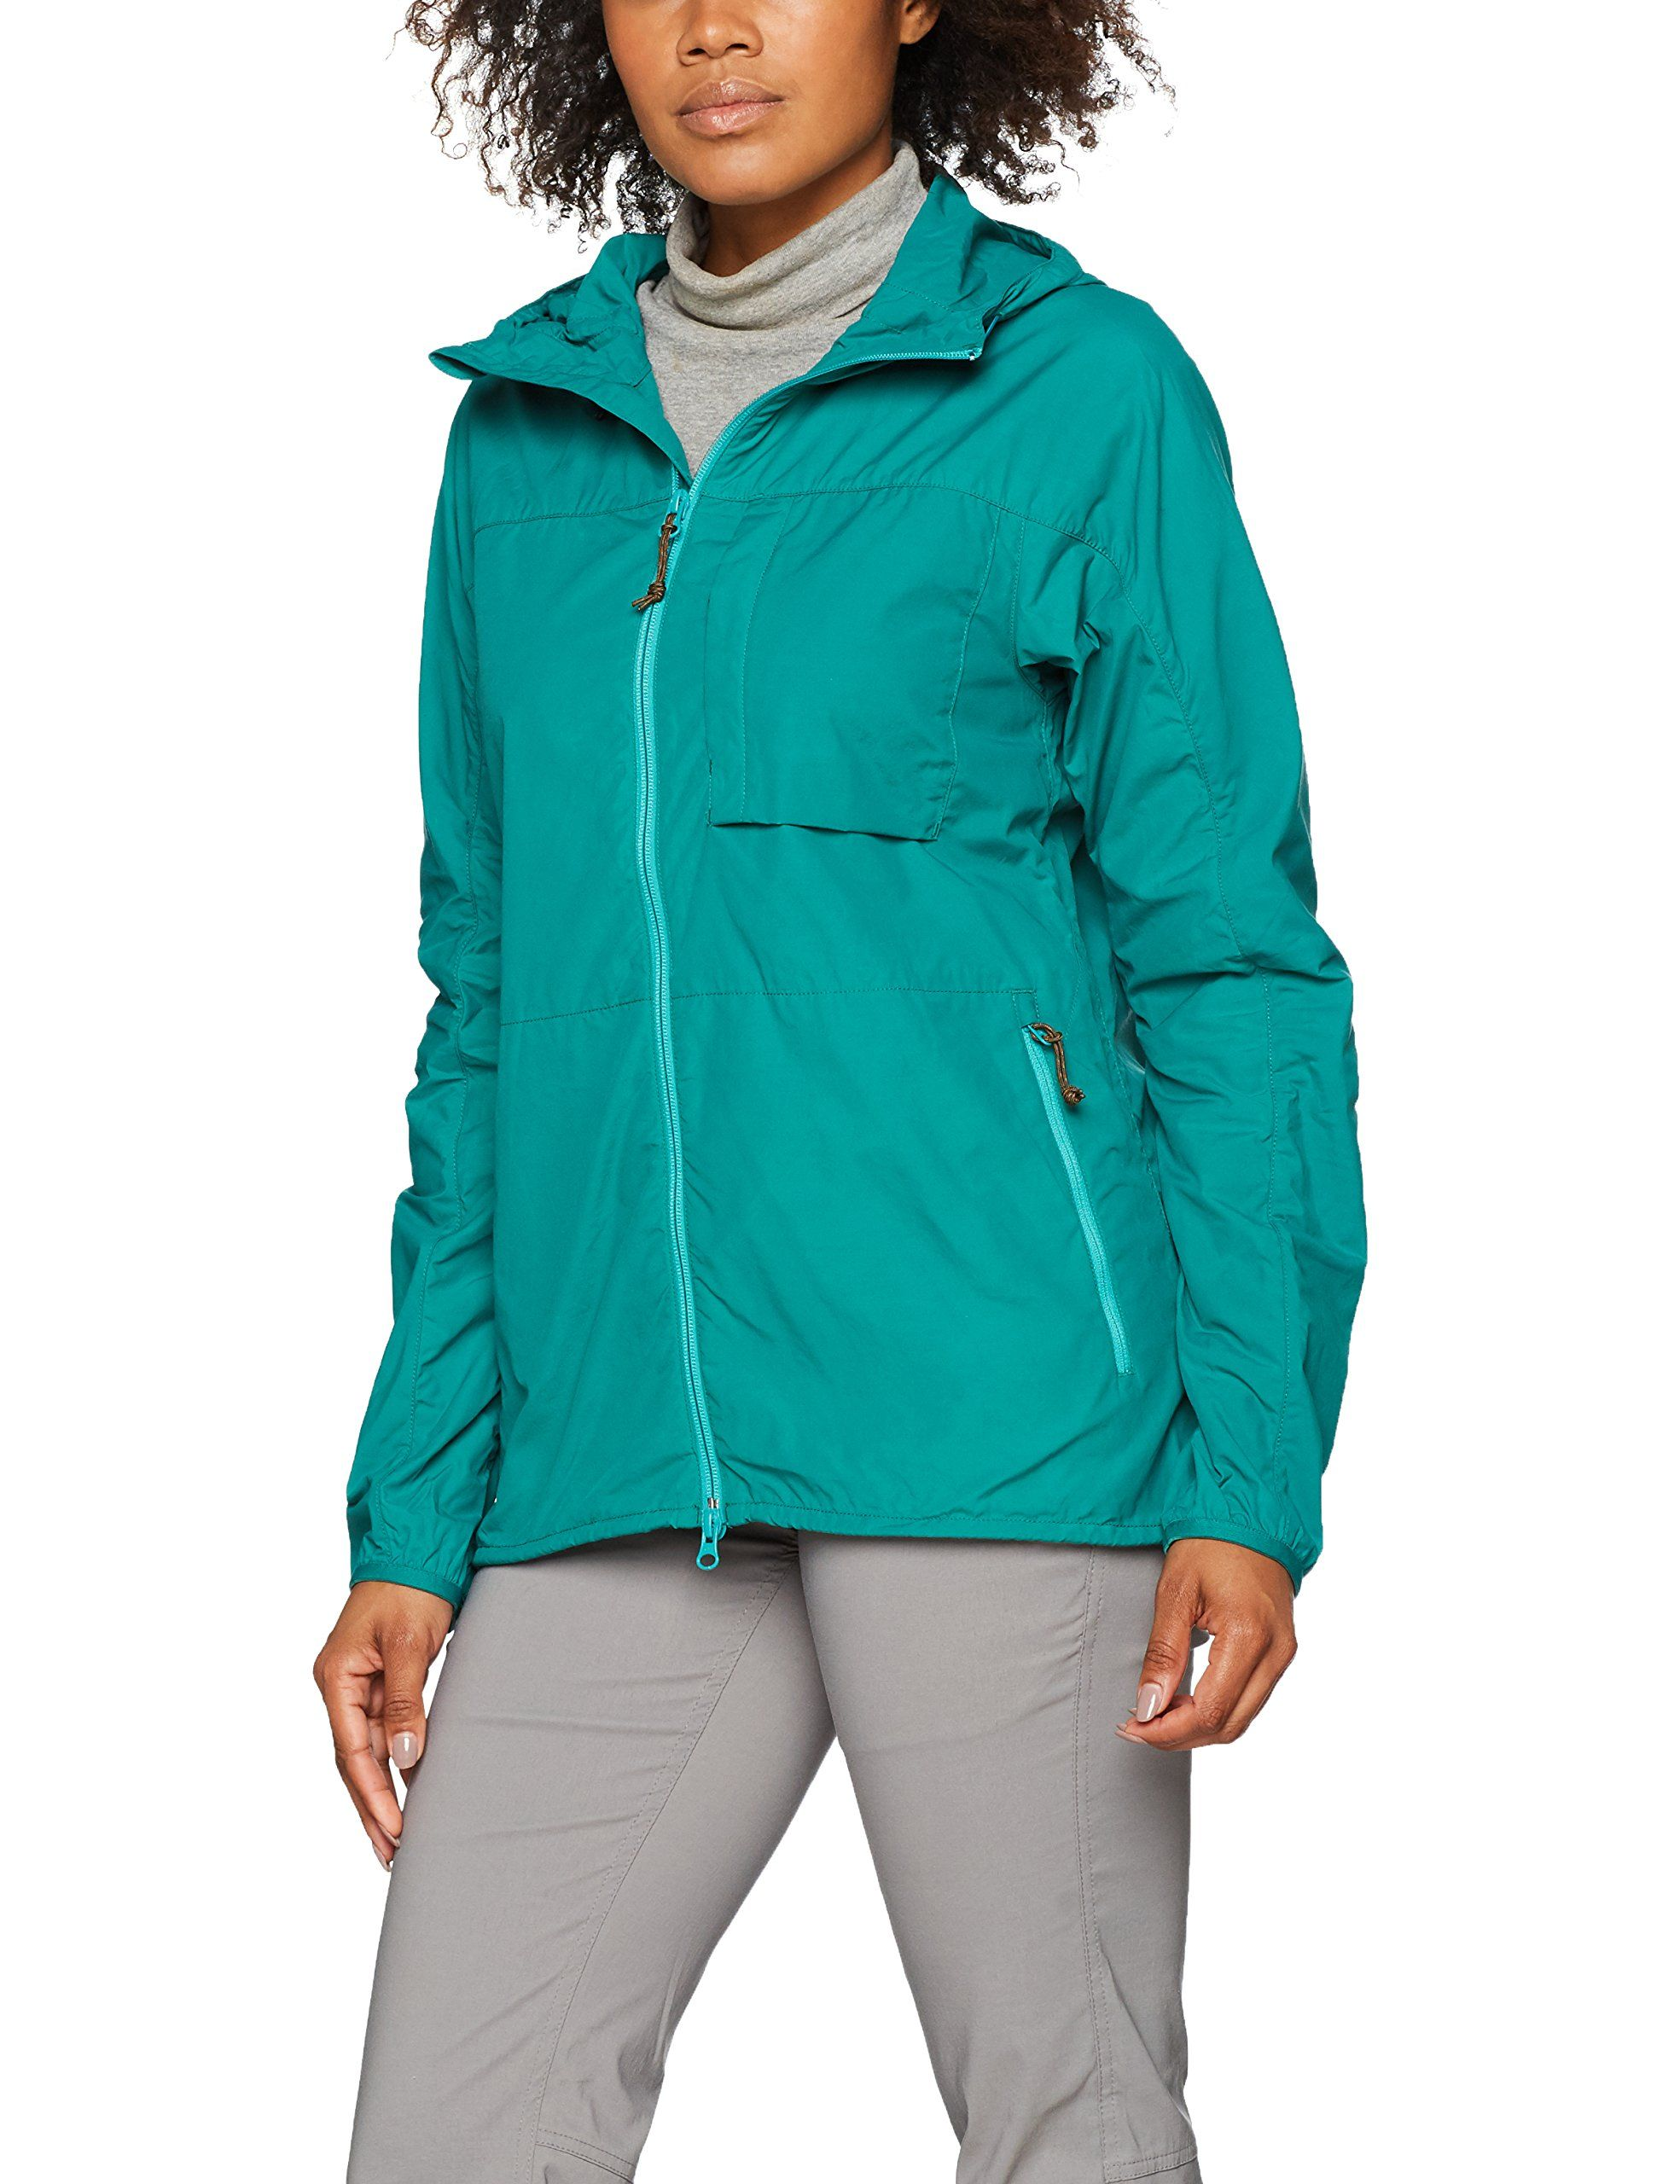 Fjallraven Womens High Coast Wind Jacket